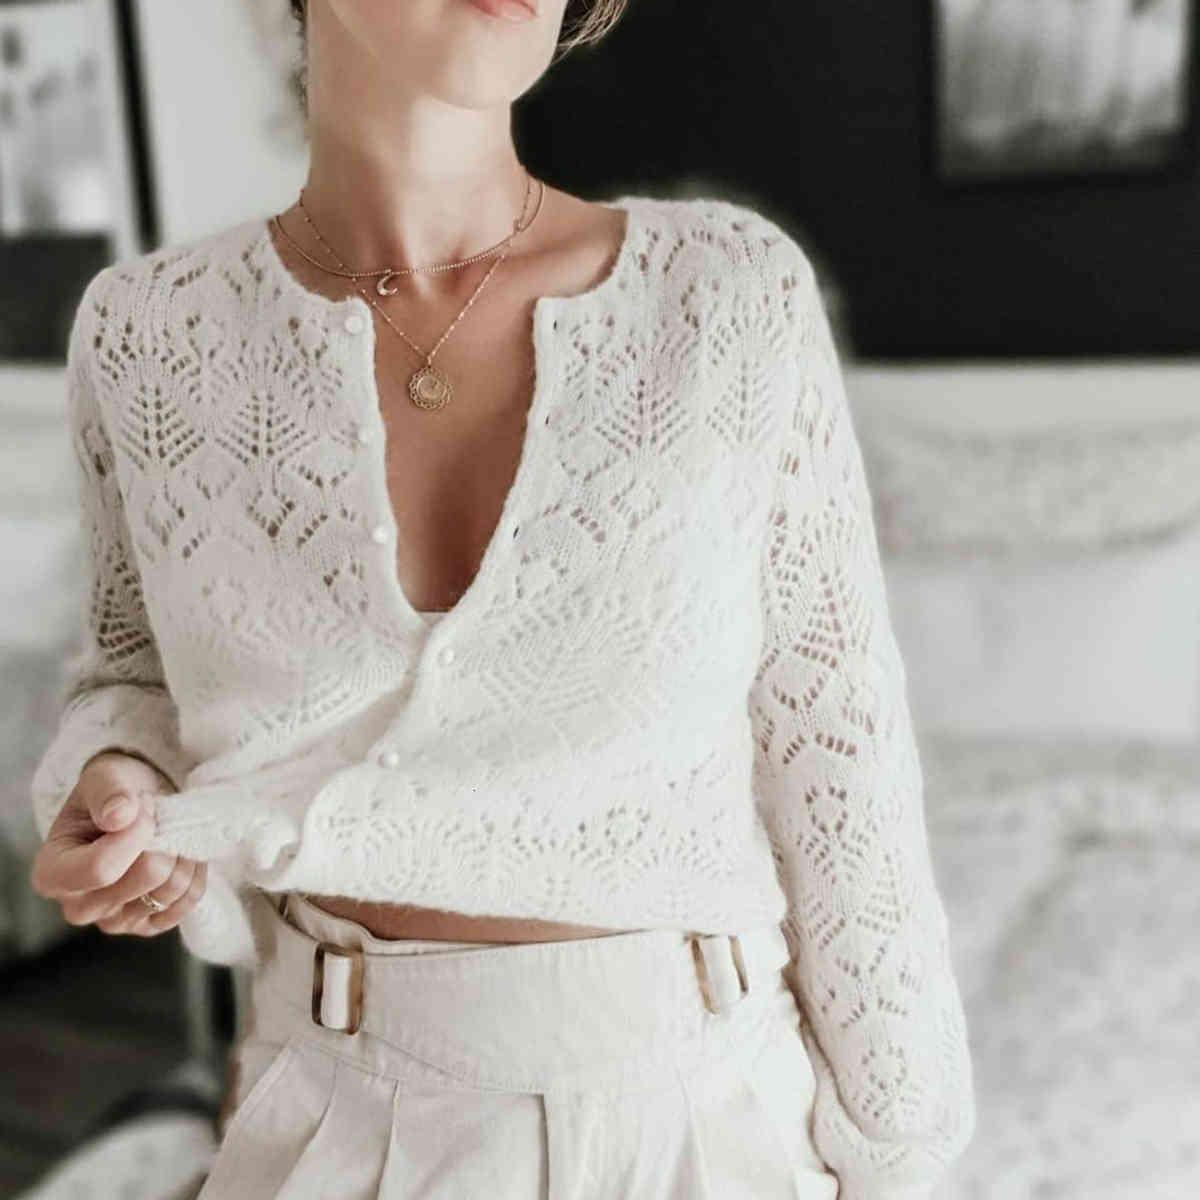 suéter fancy knit jumper mujeres invierno otoño elegante manga larga oneck mohair lana cálido suéter casual vintage chic cardigan gilet w67g